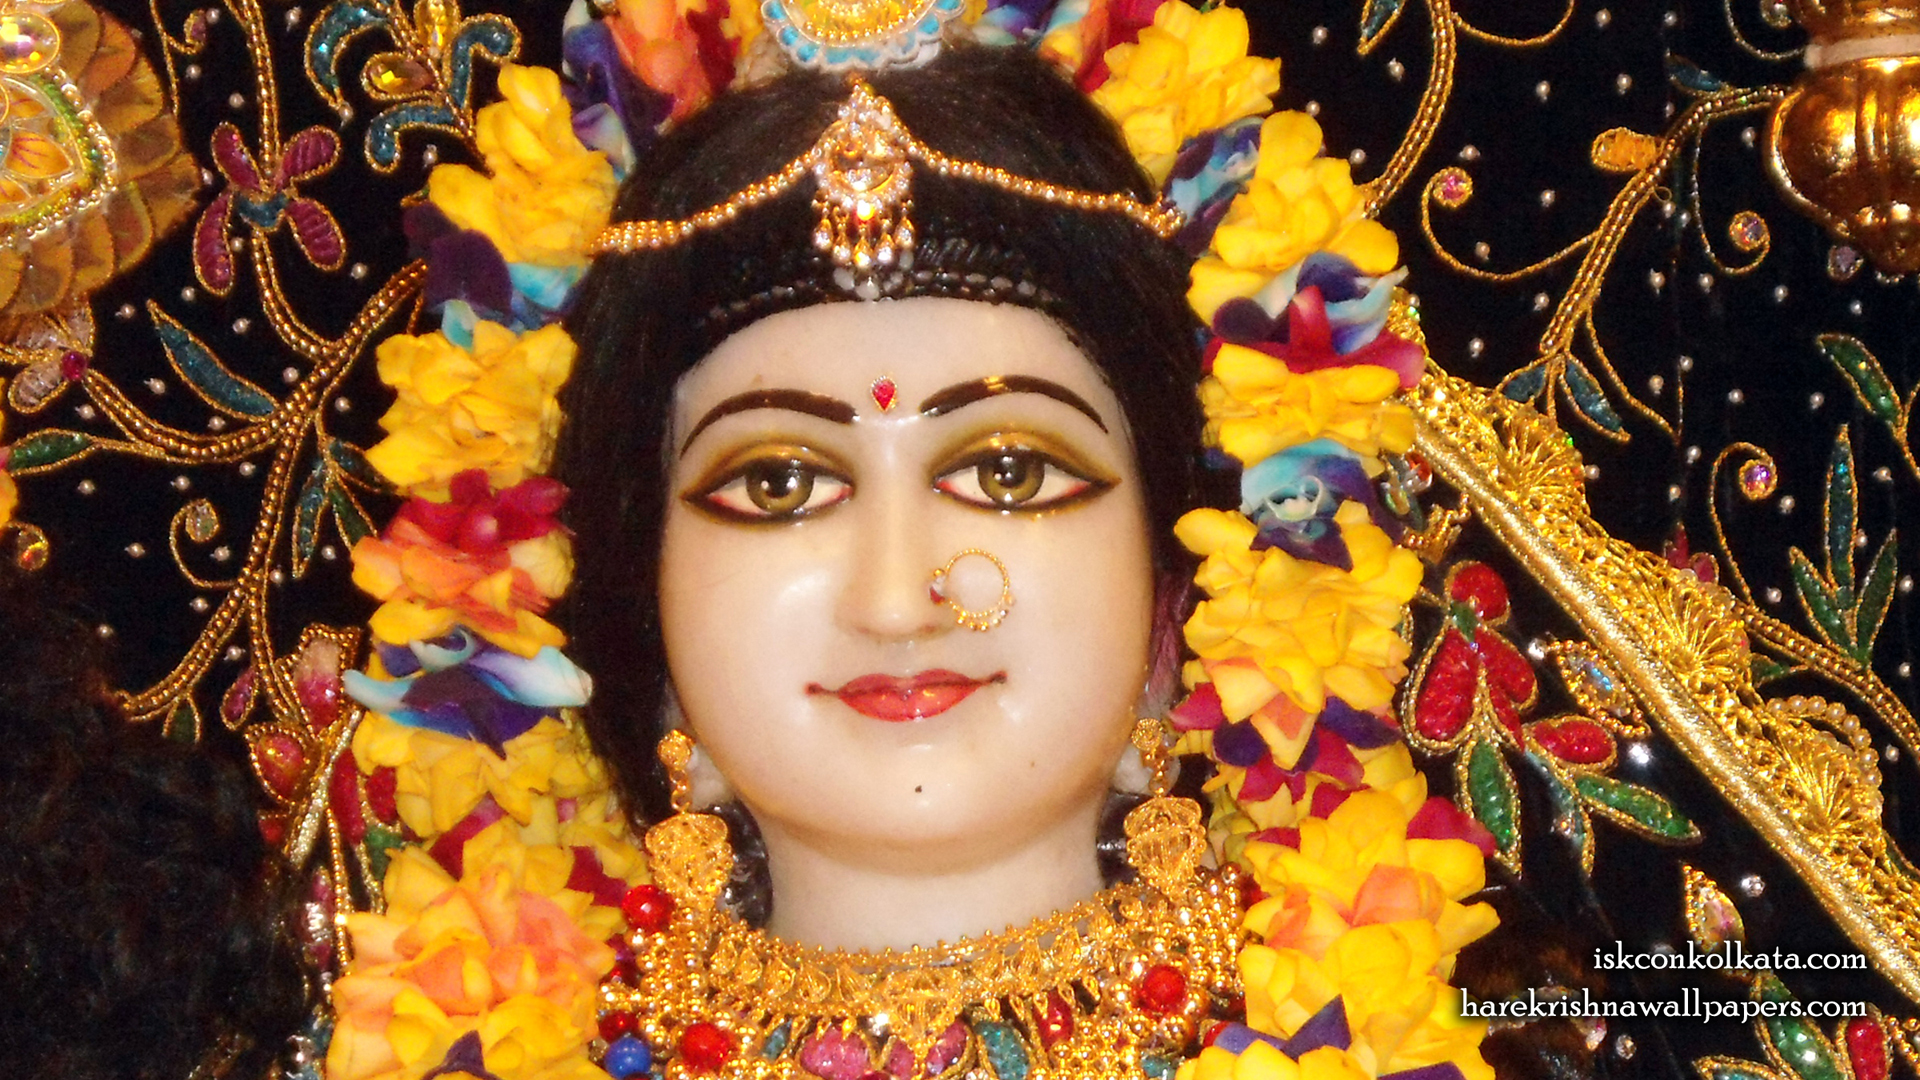 Sri Radha Close up Wallpaper (001) Size 1920x1080 Download